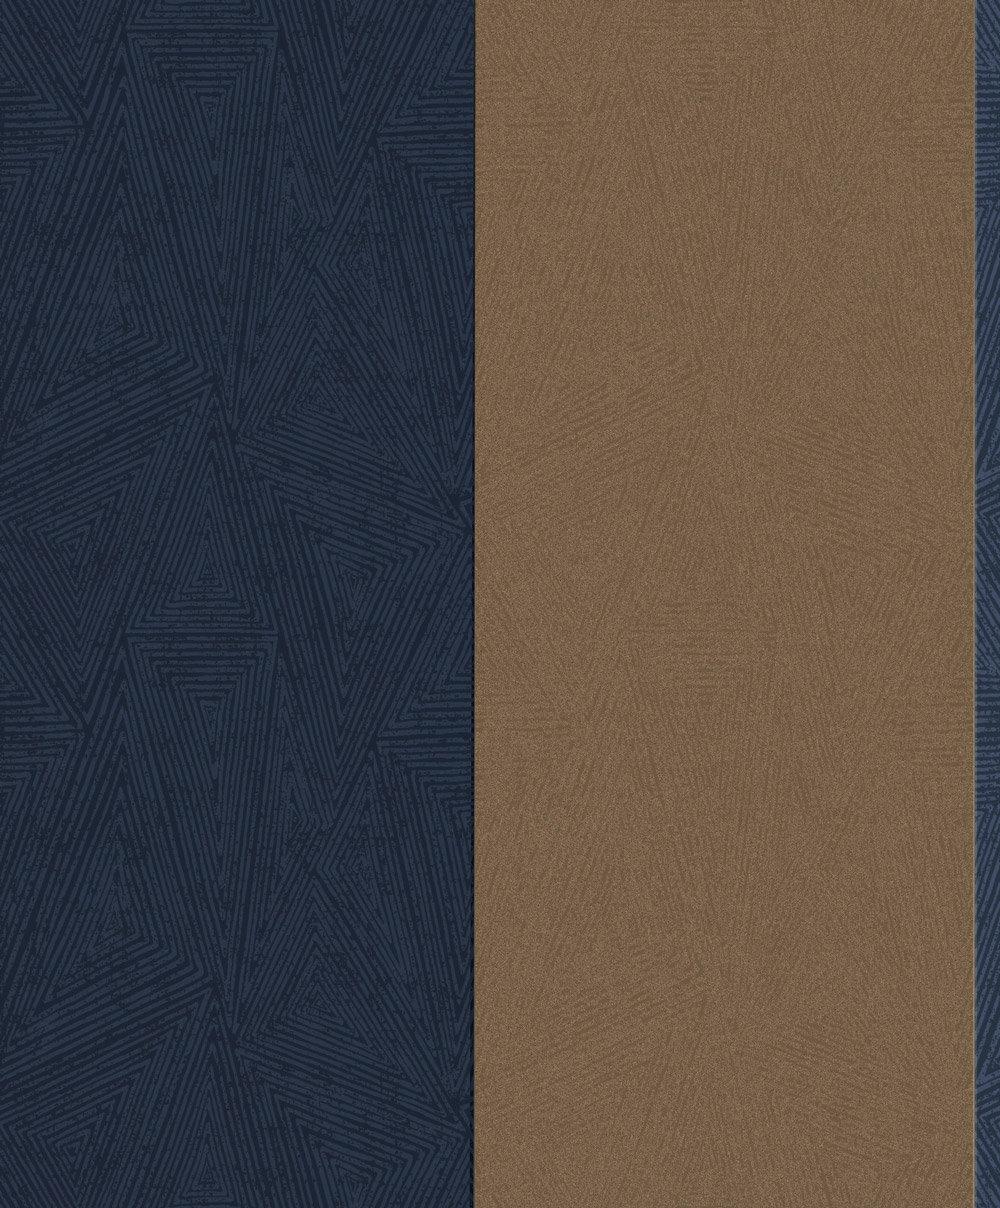 Albany Galena Galena Navy Wallpaper - Product code: 65603